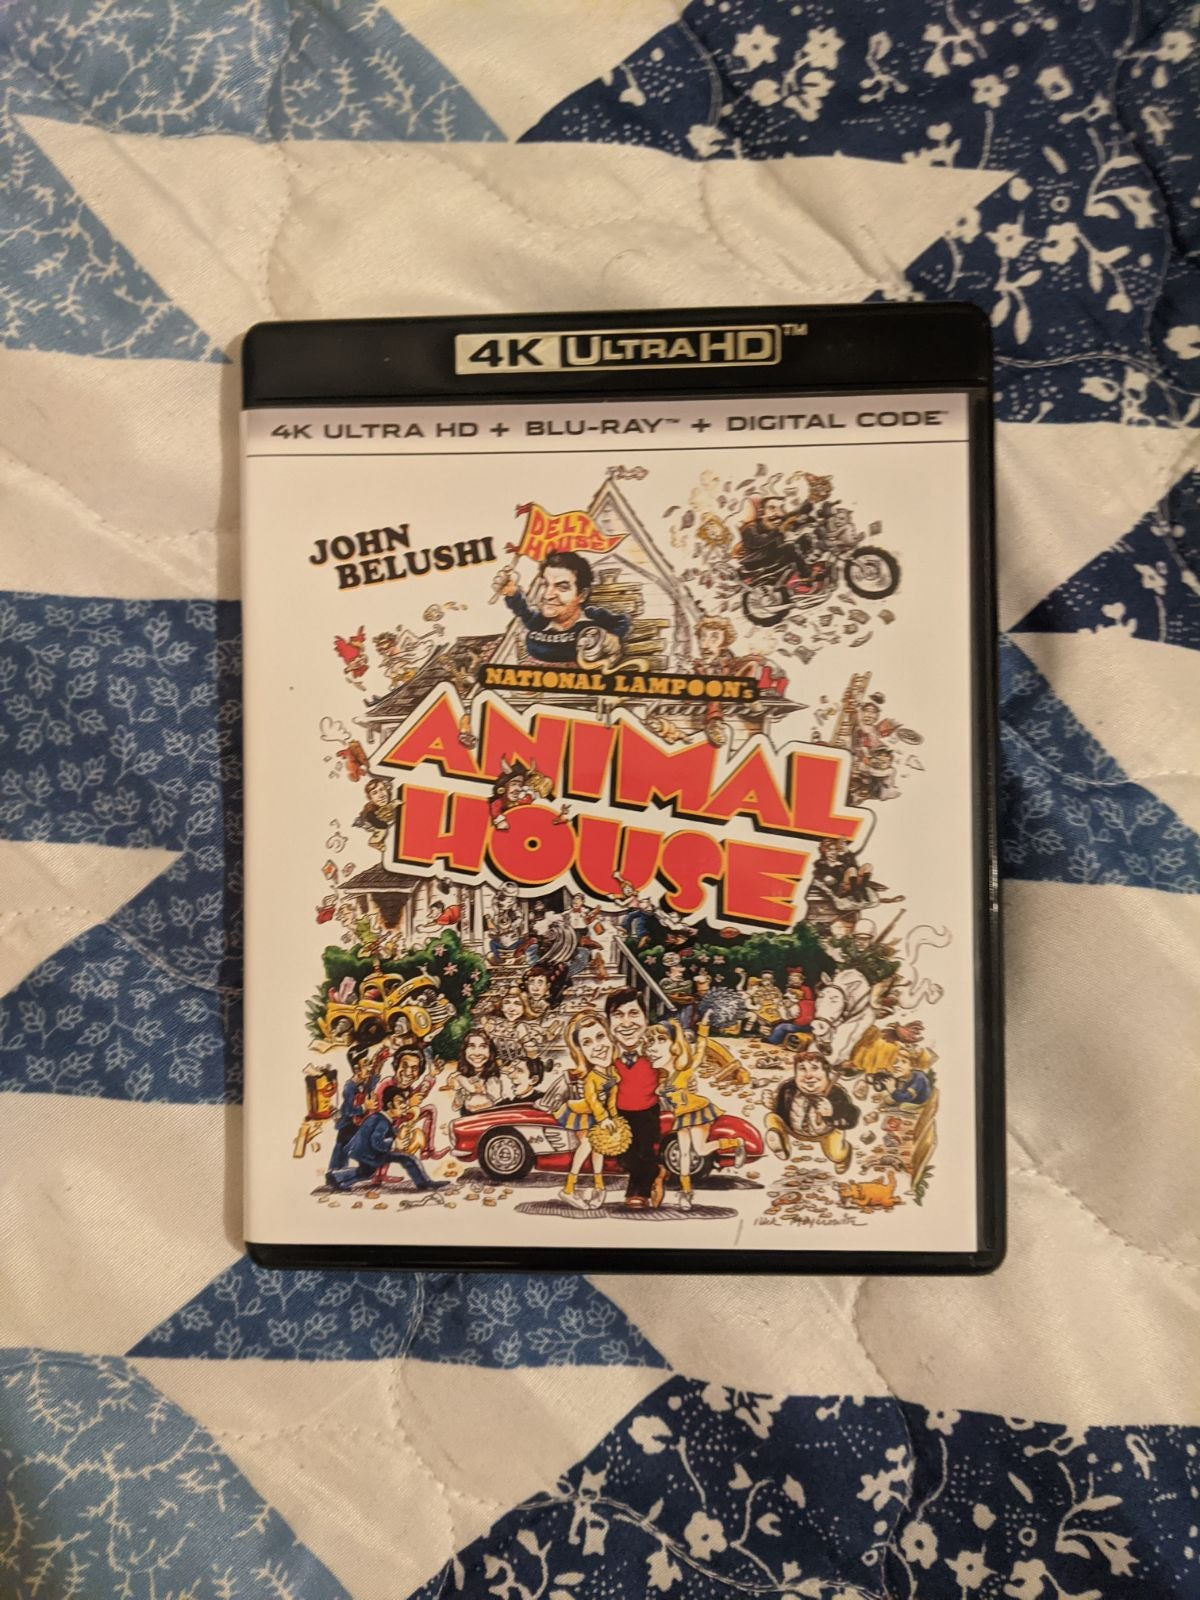 Animal House 4K UHD Bluray